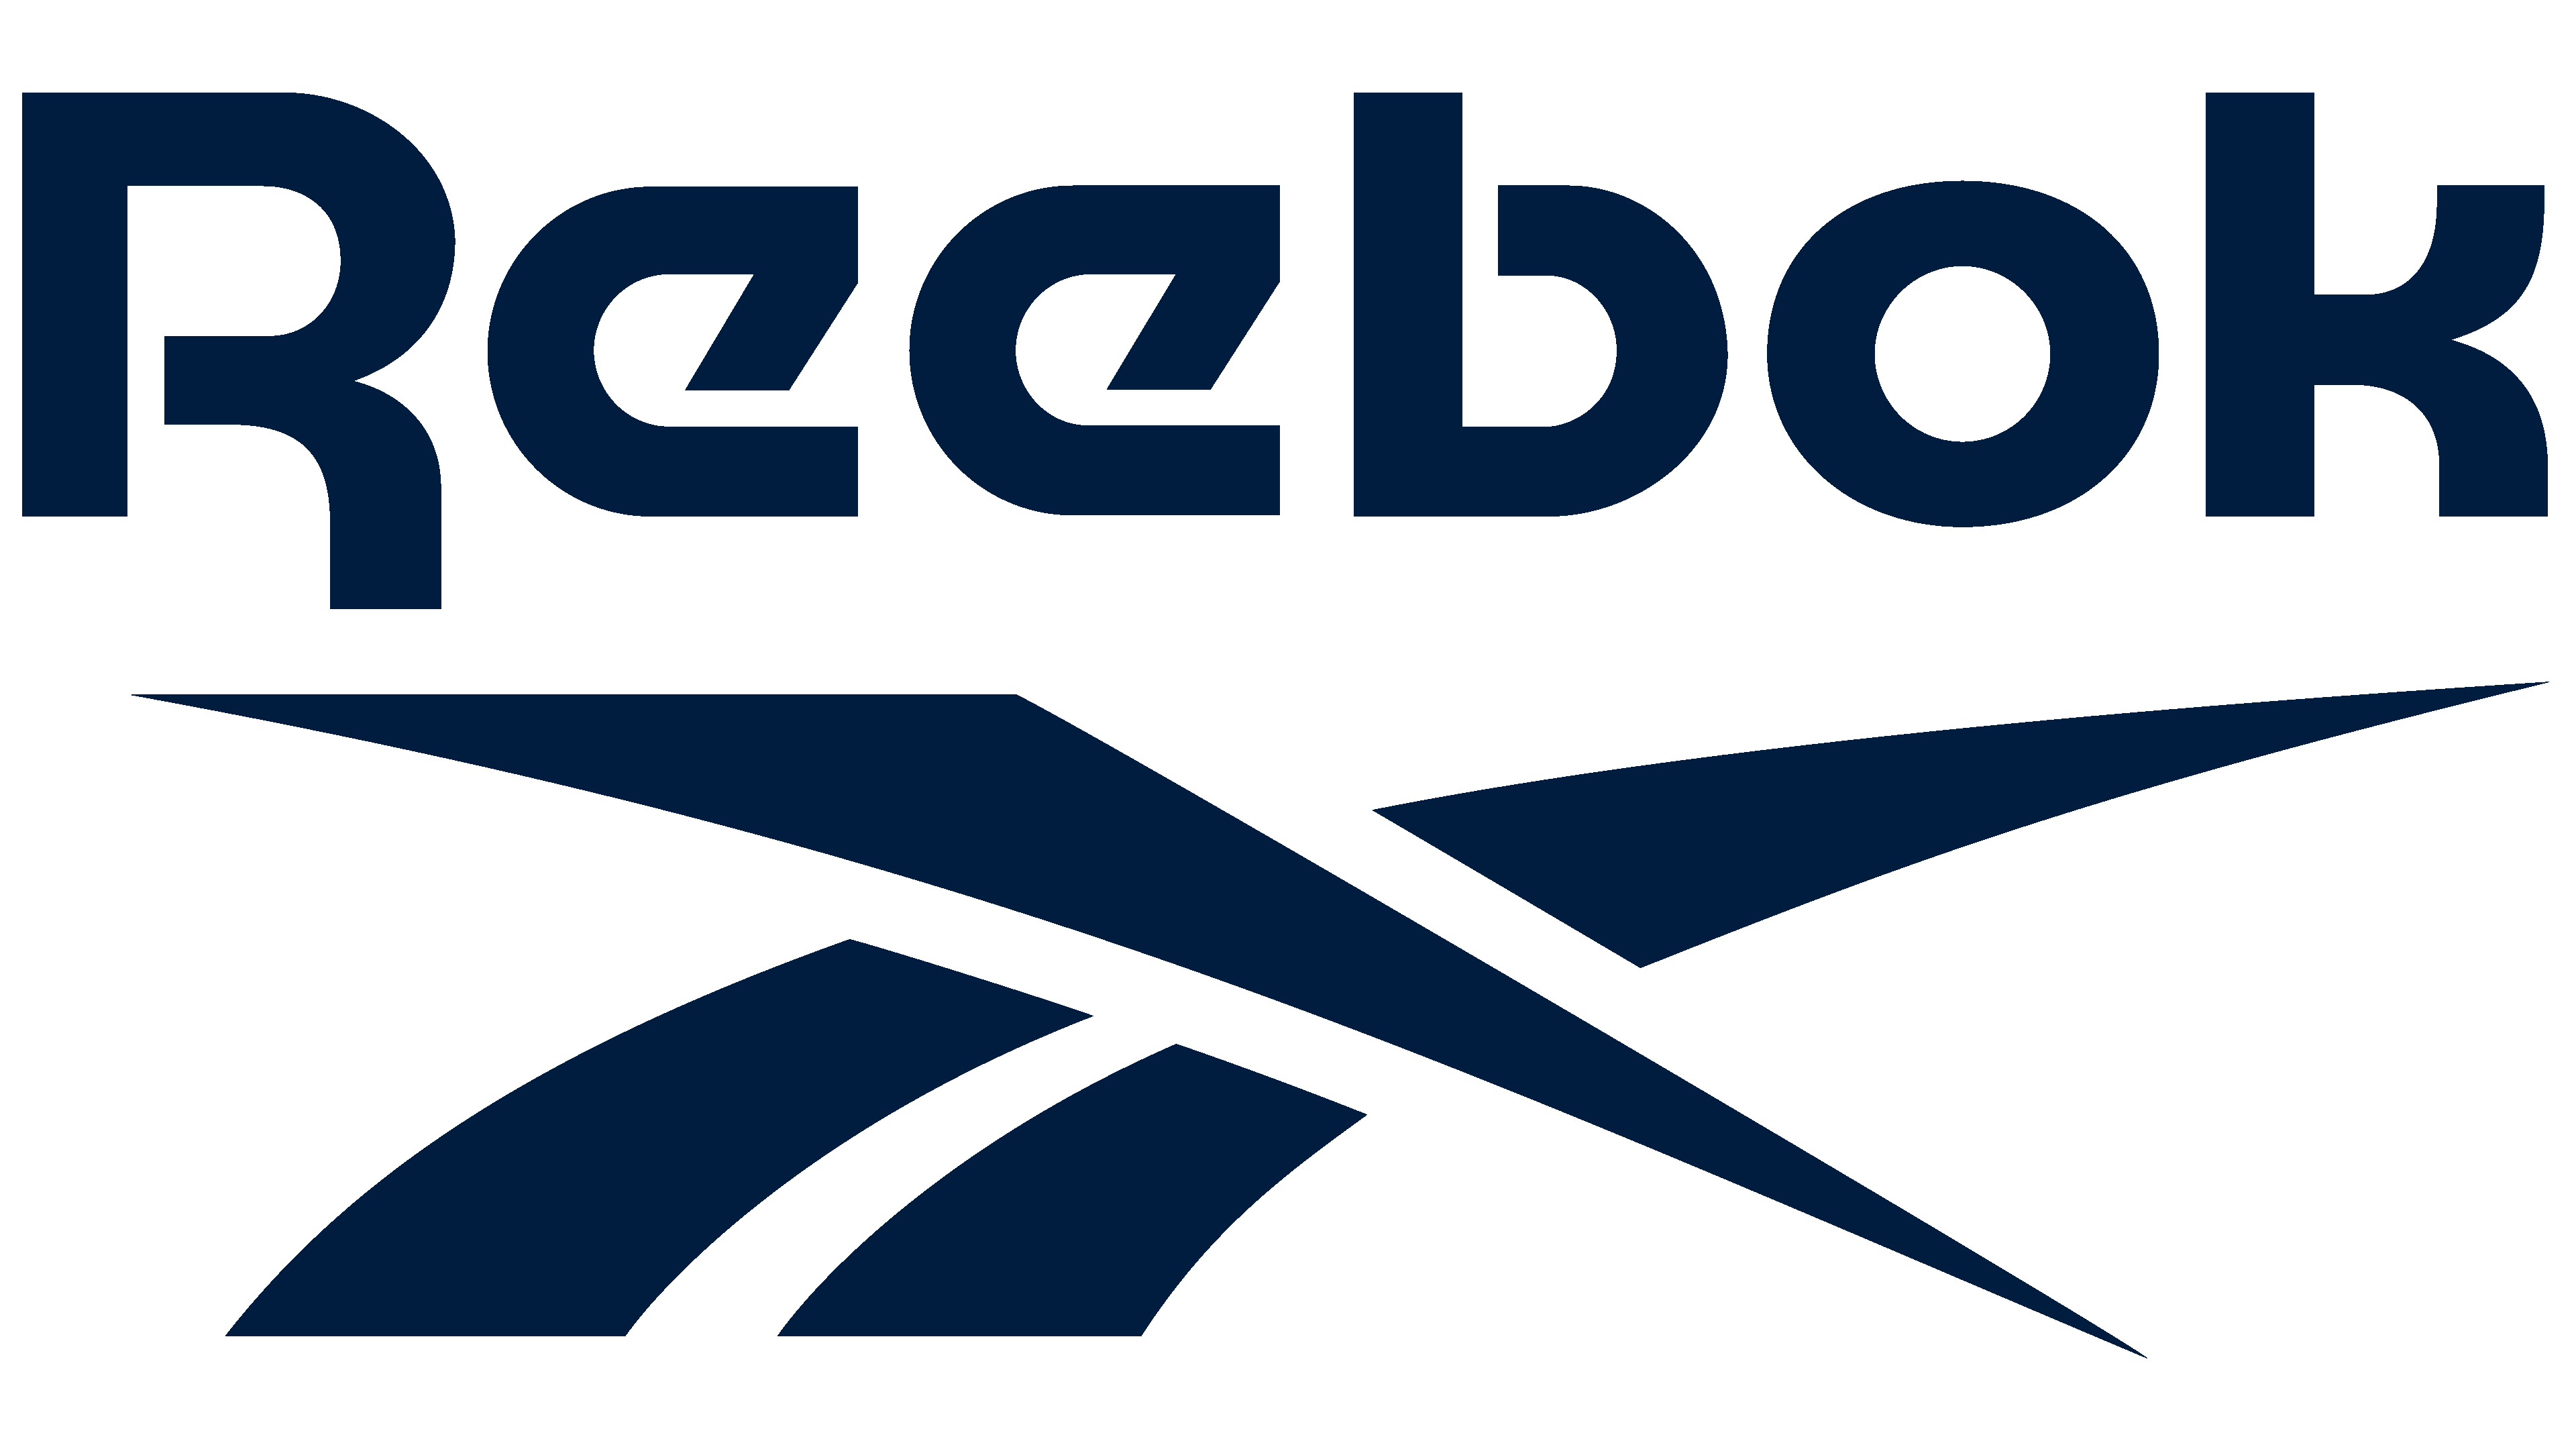 Reebock